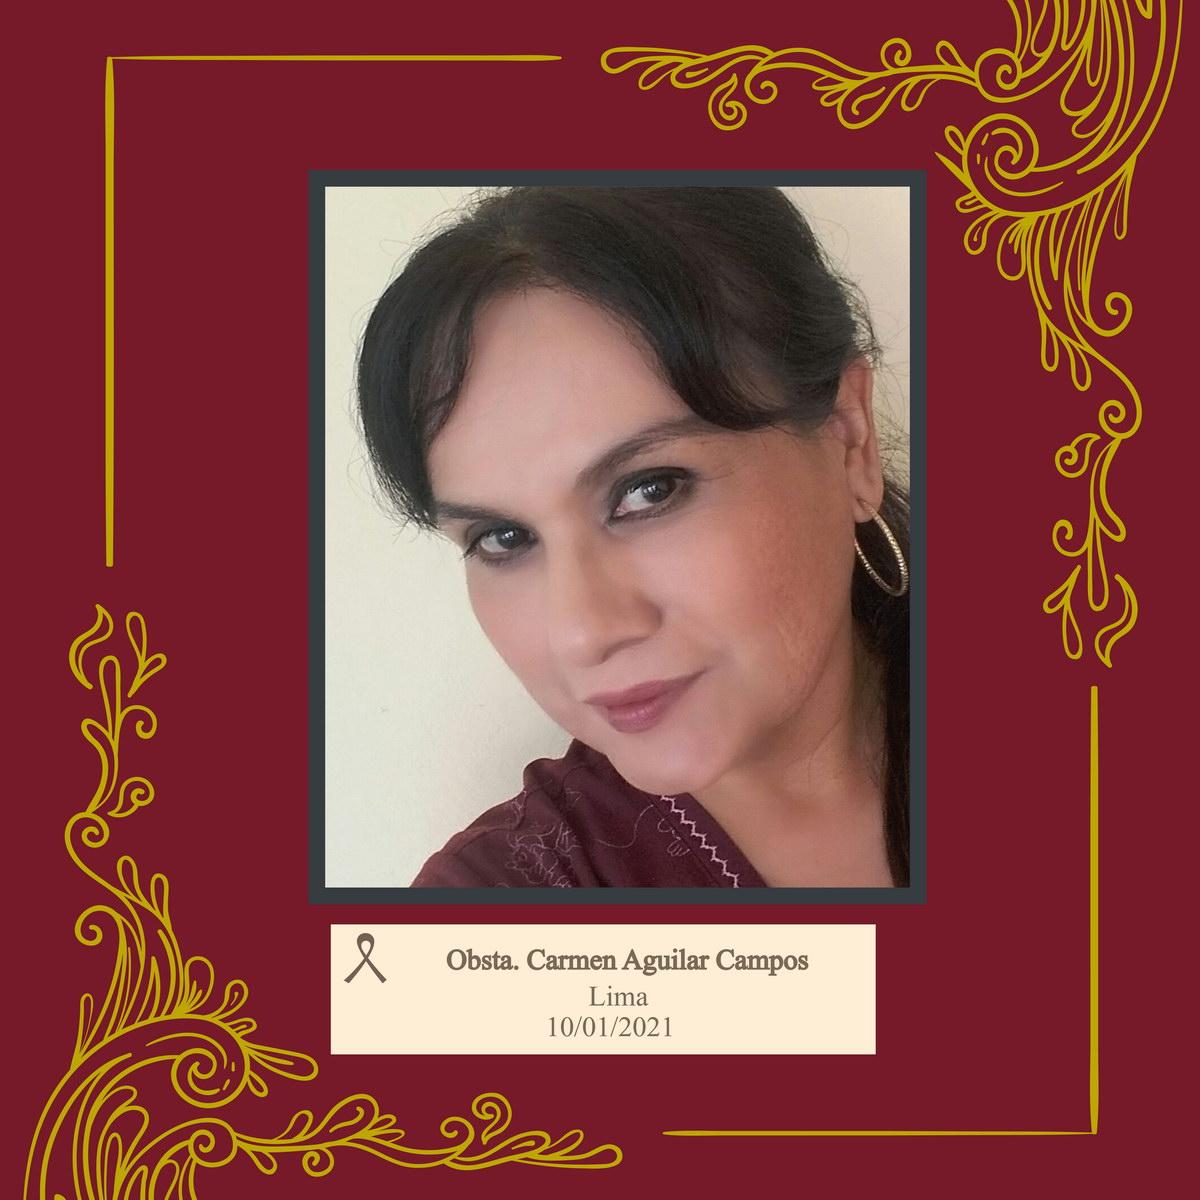 Carmen Aguilar Campos